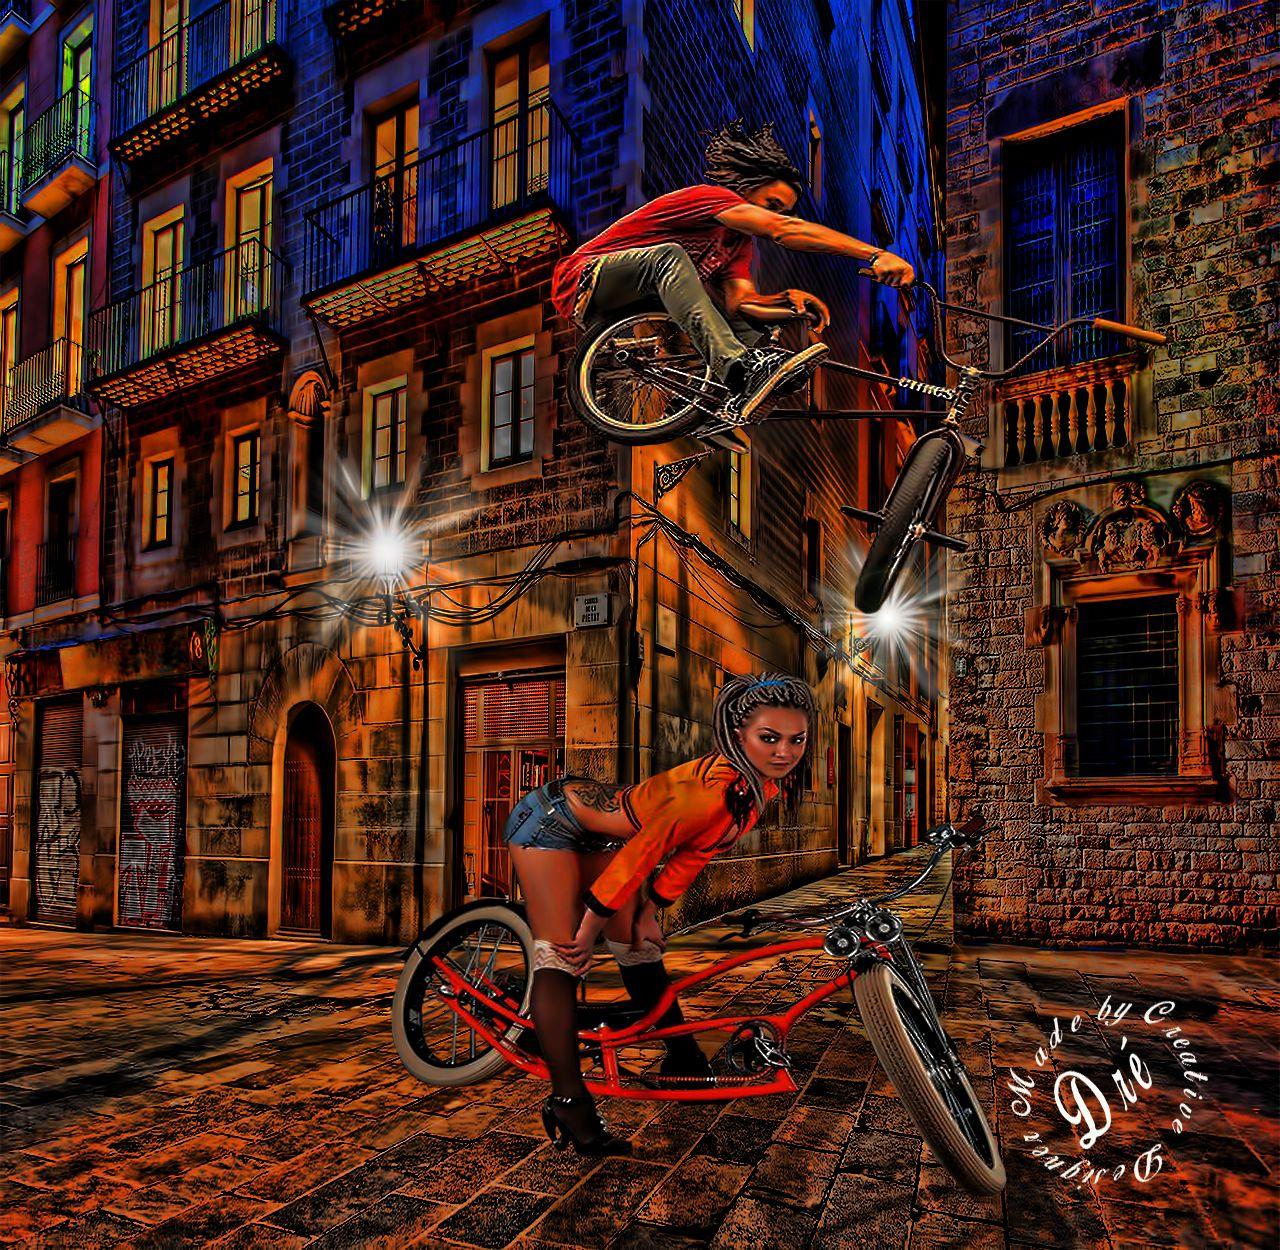 photoshop art by me https://www.facebook.com/GraphicdesignerDreKamasukhraj